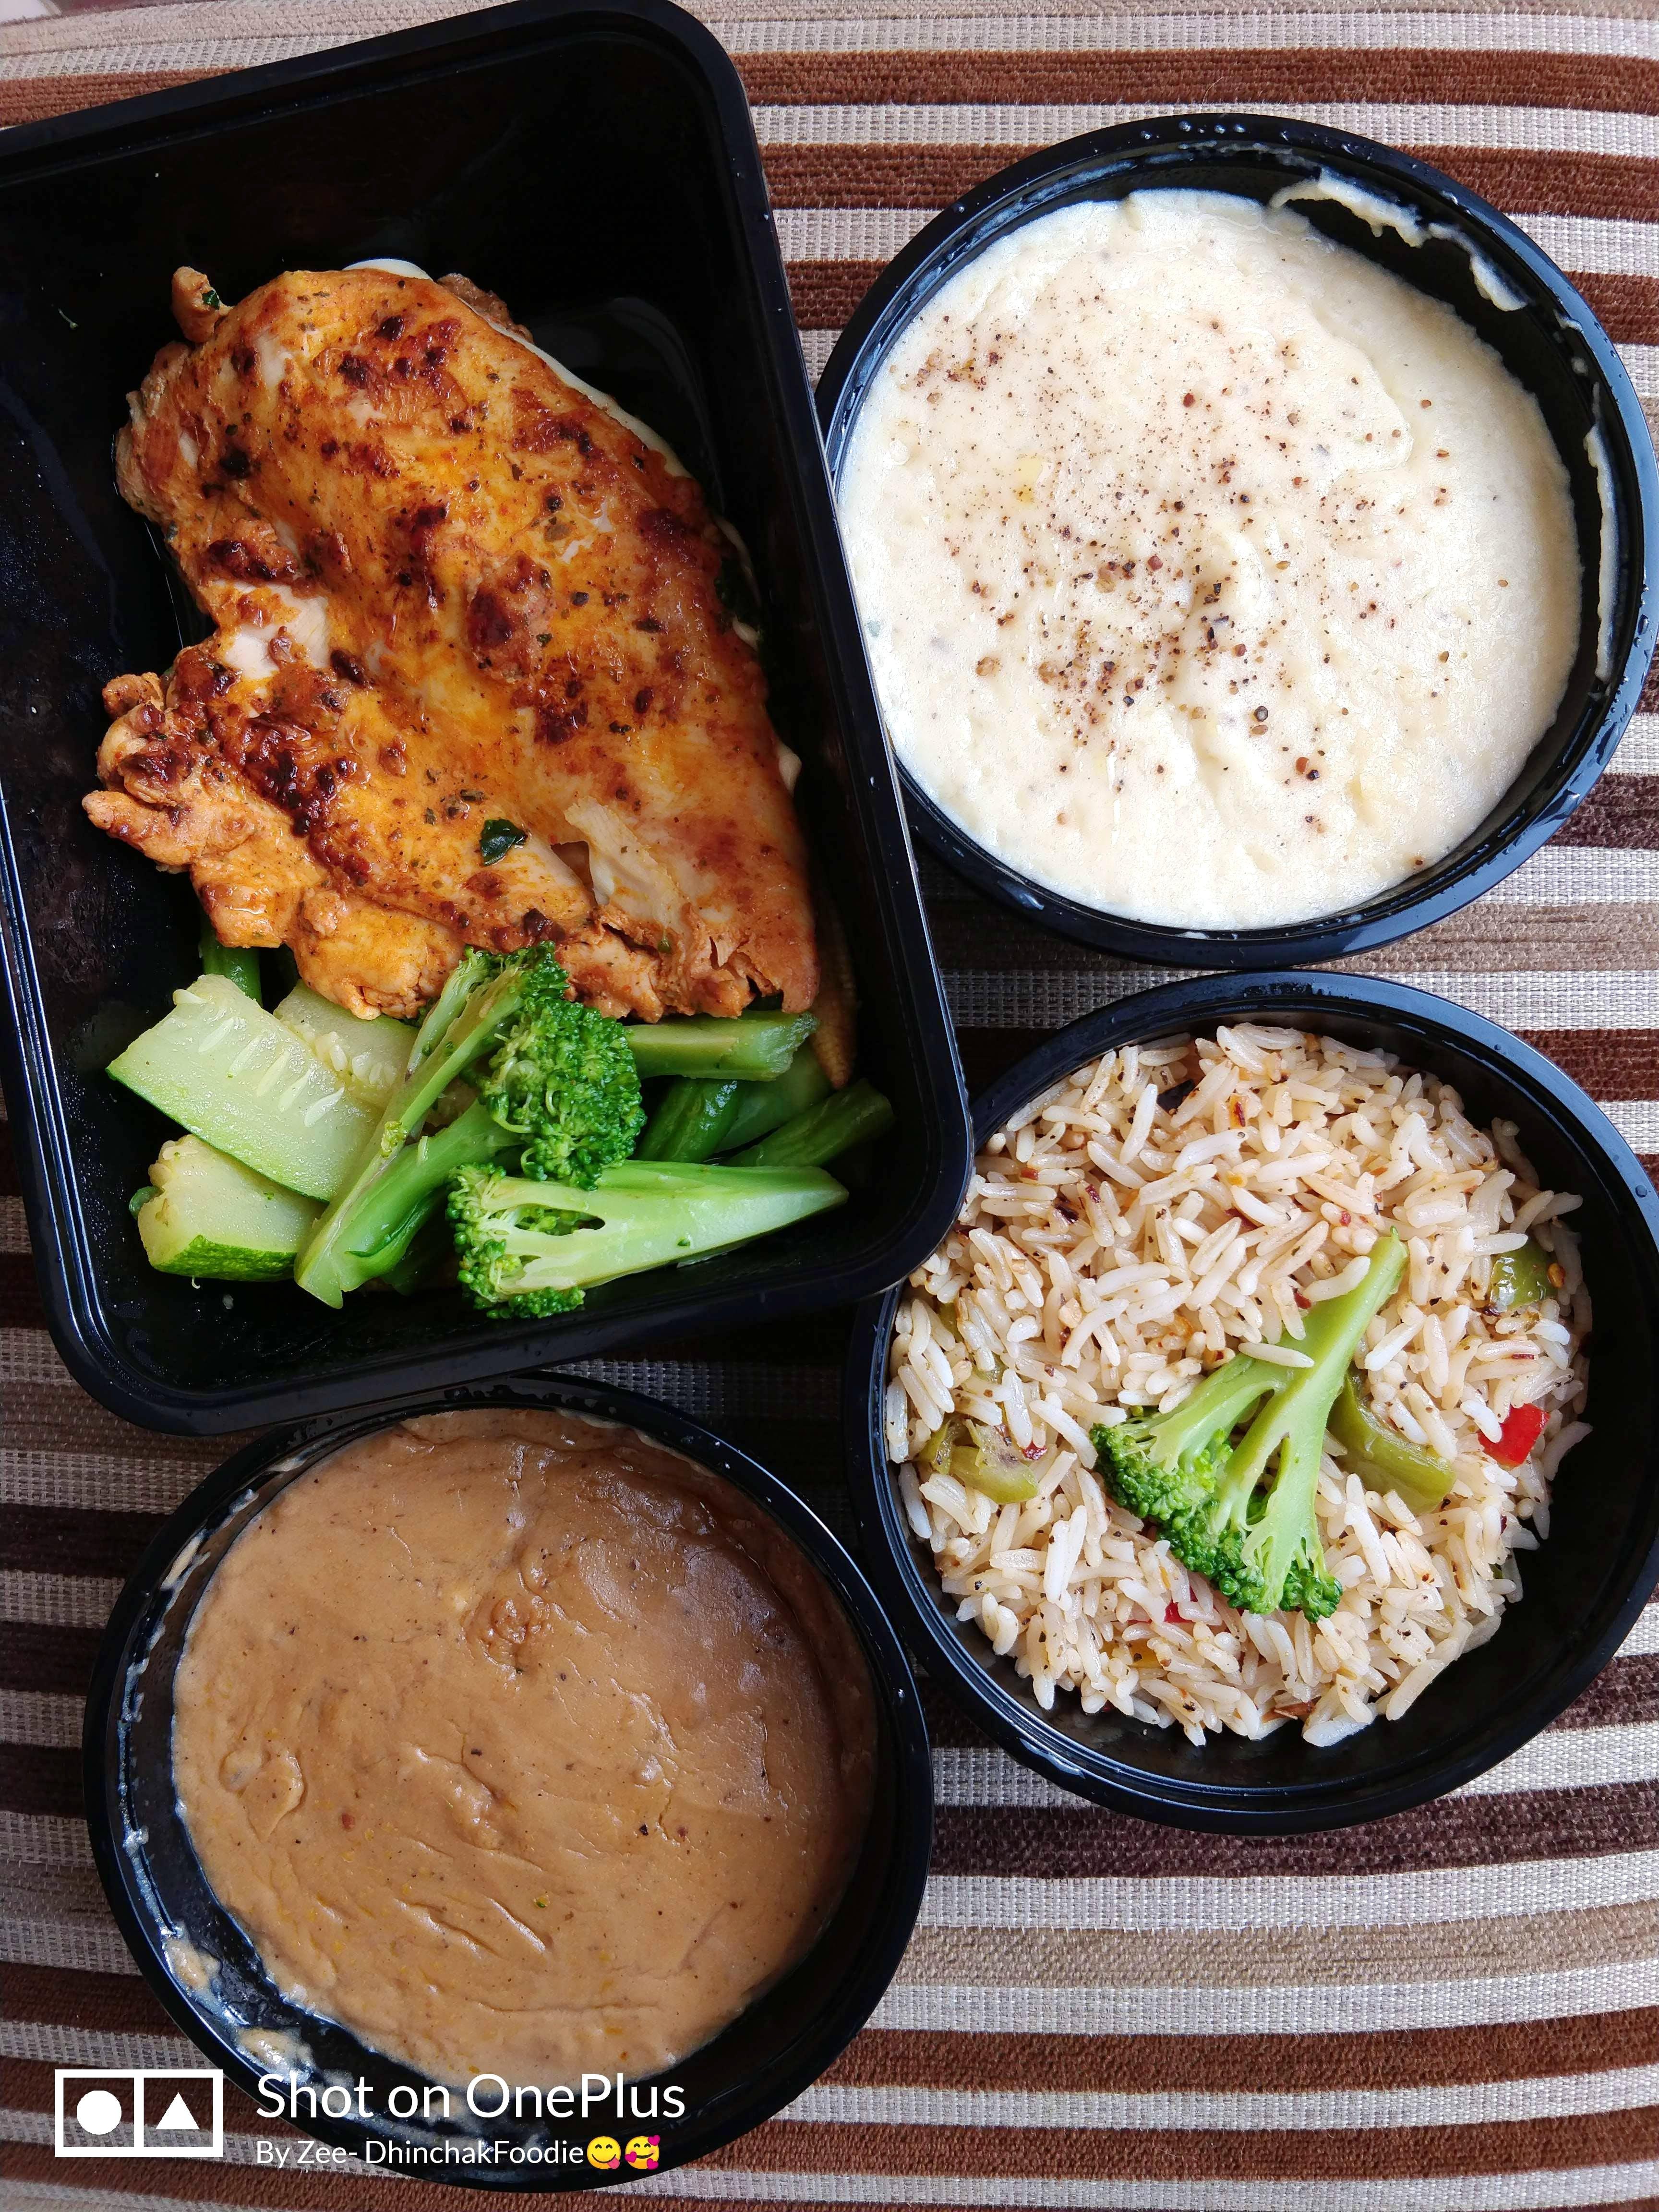 Healthy Much? Order Yum Chicken Steak From This Delivery Kitchen Now!